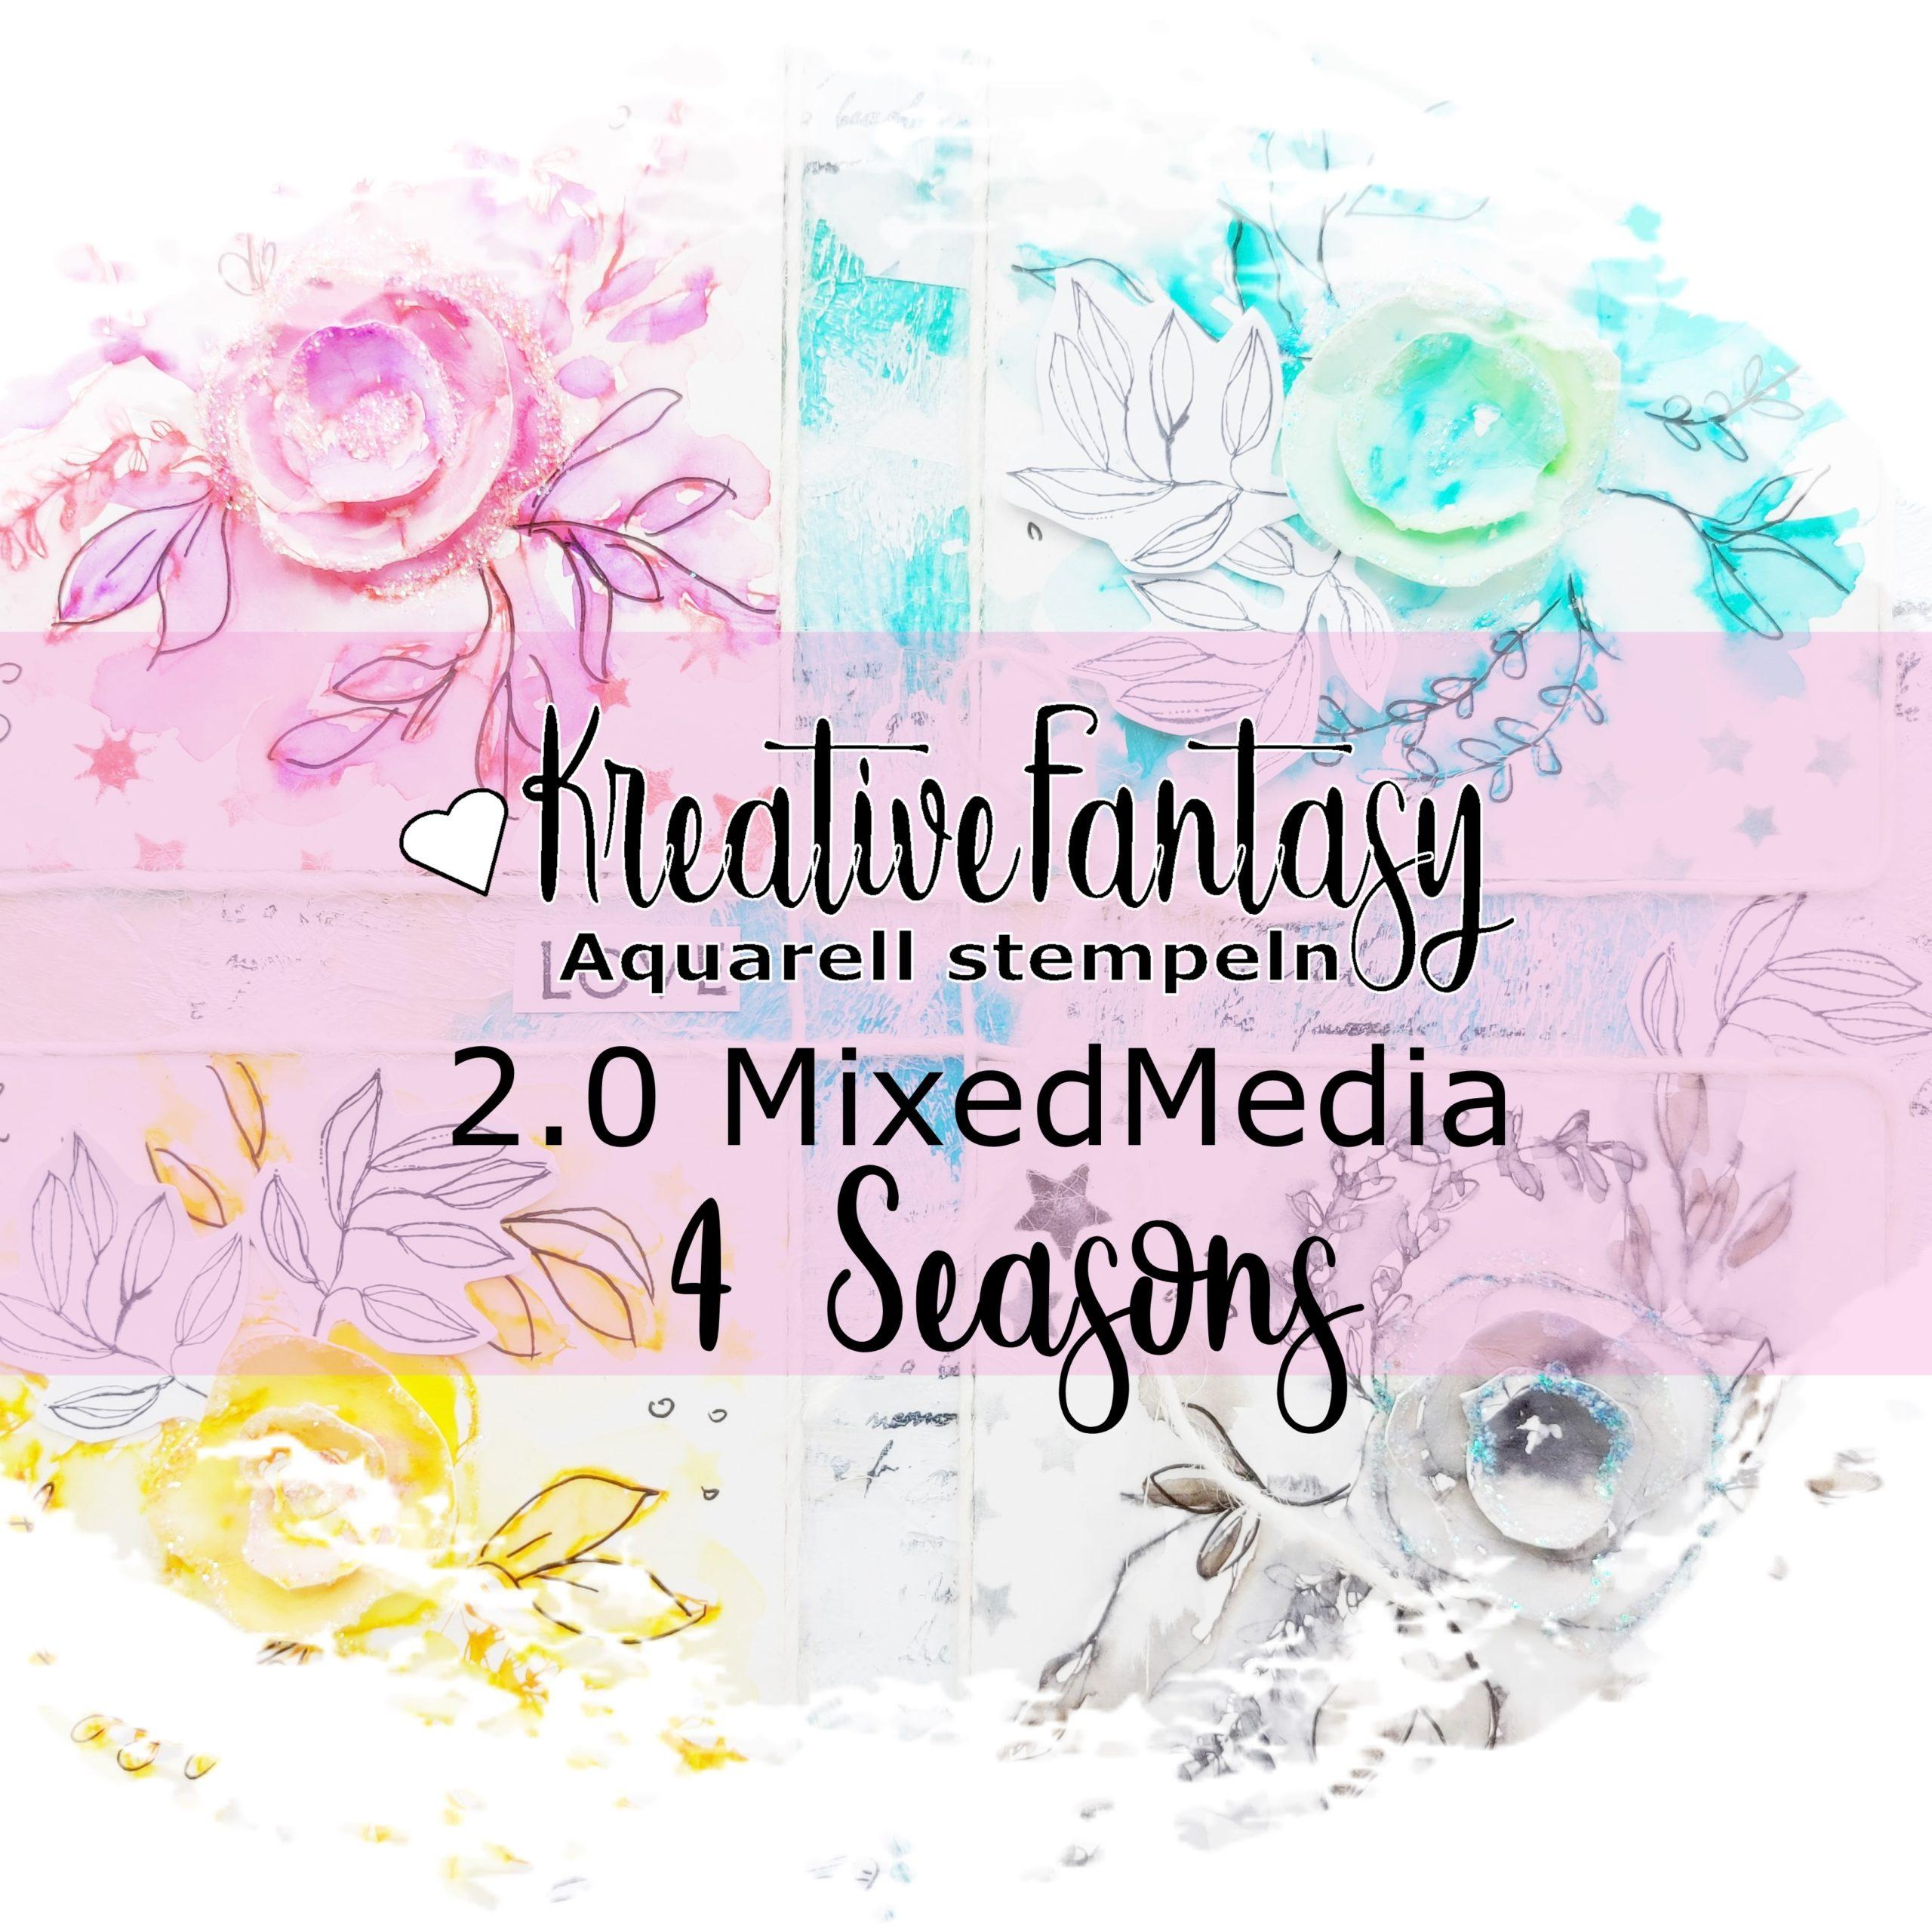 Titelbild Aquarell-Stempeln 2.0 Mixed Media 4 seasons